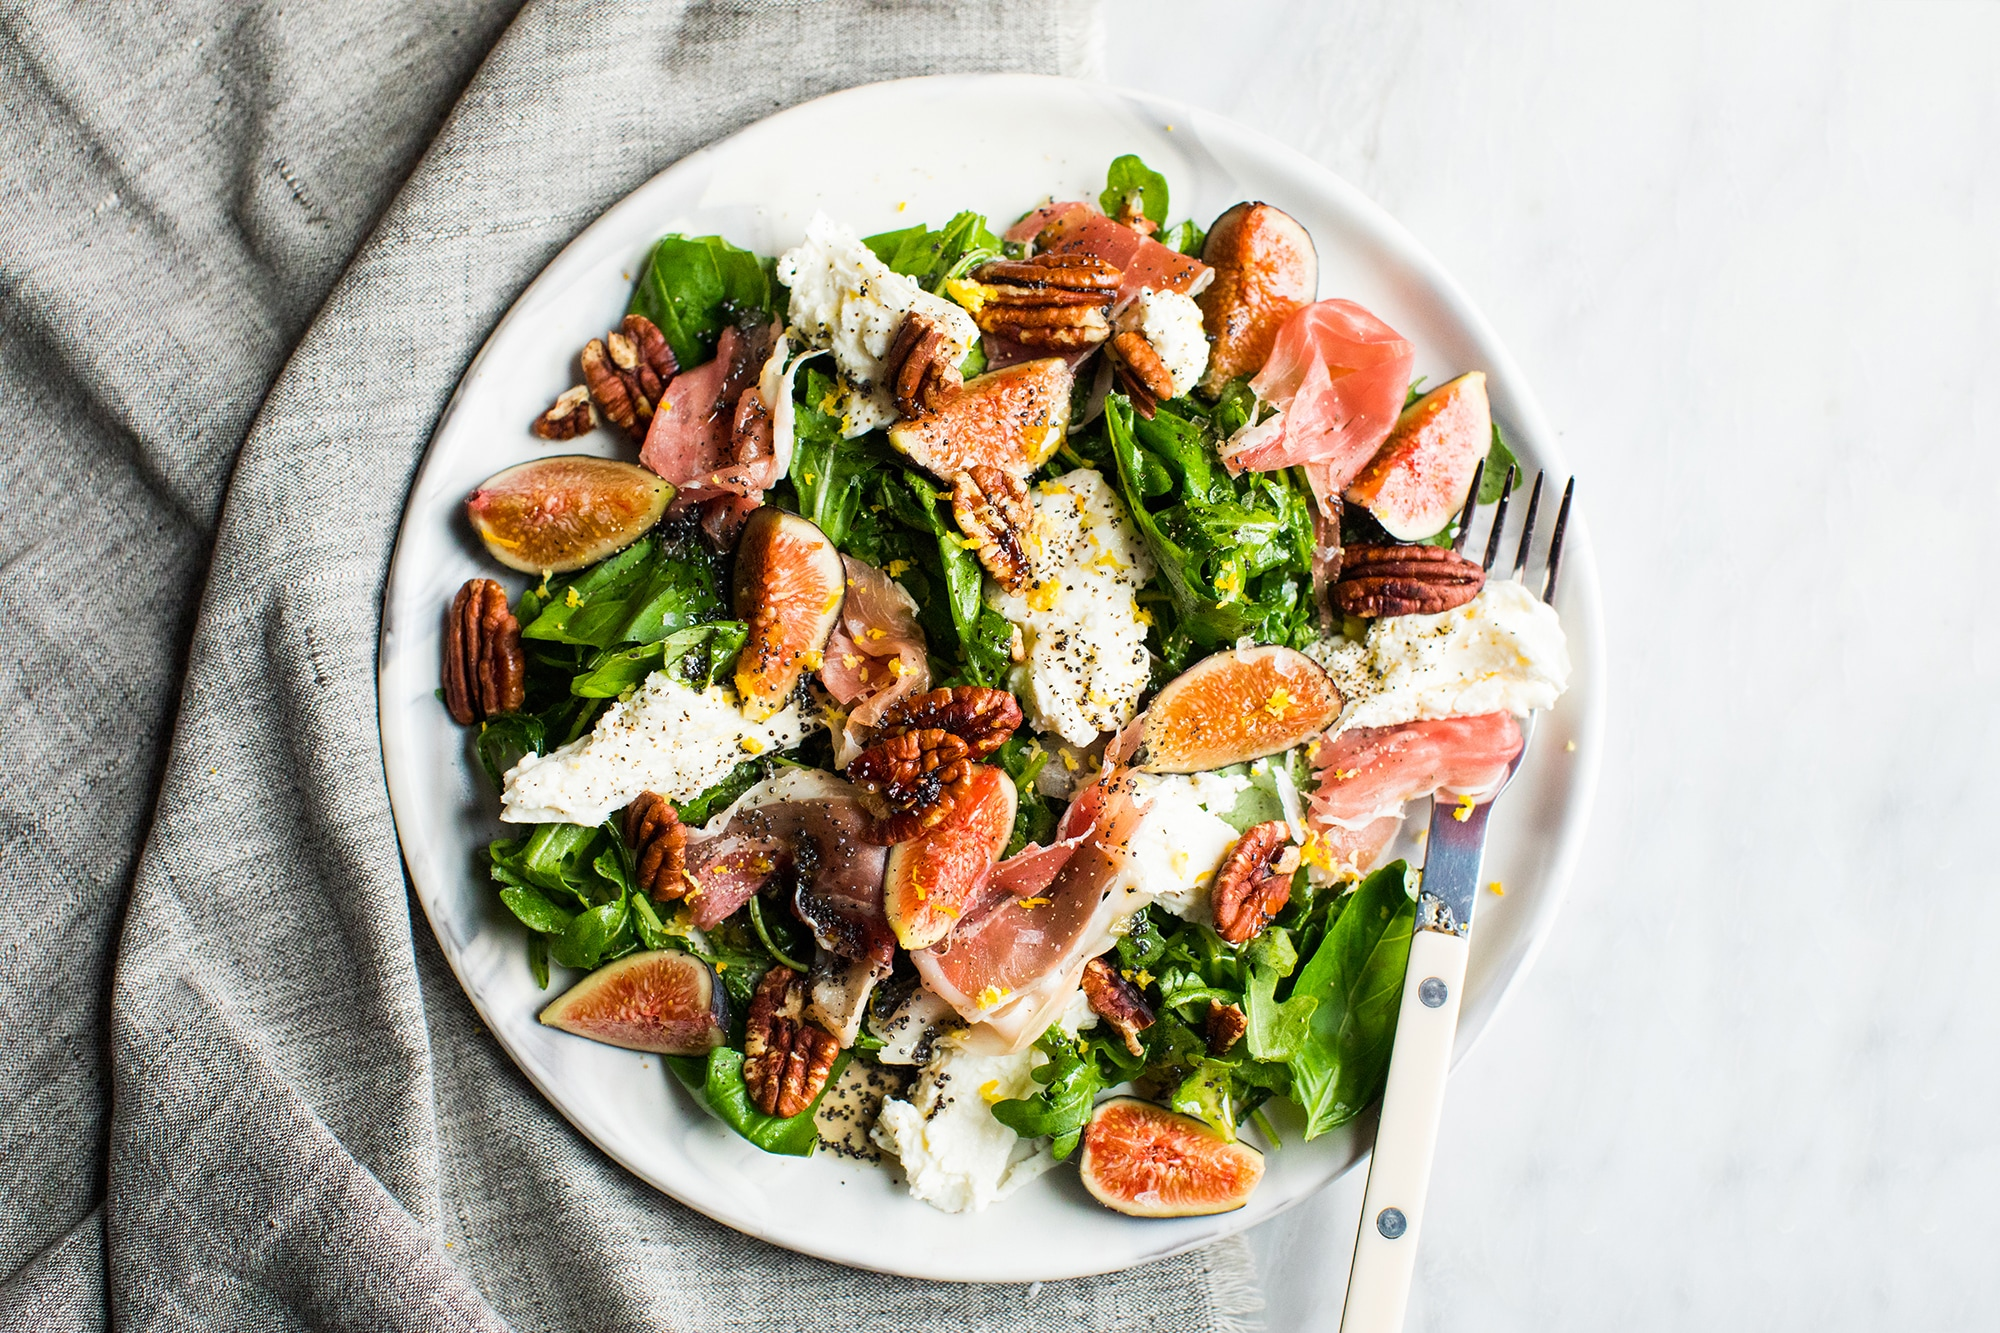 Autumn Salad: Fig and Prosciutto Salad with Mozzarella and Poppyseed Vinaigrette